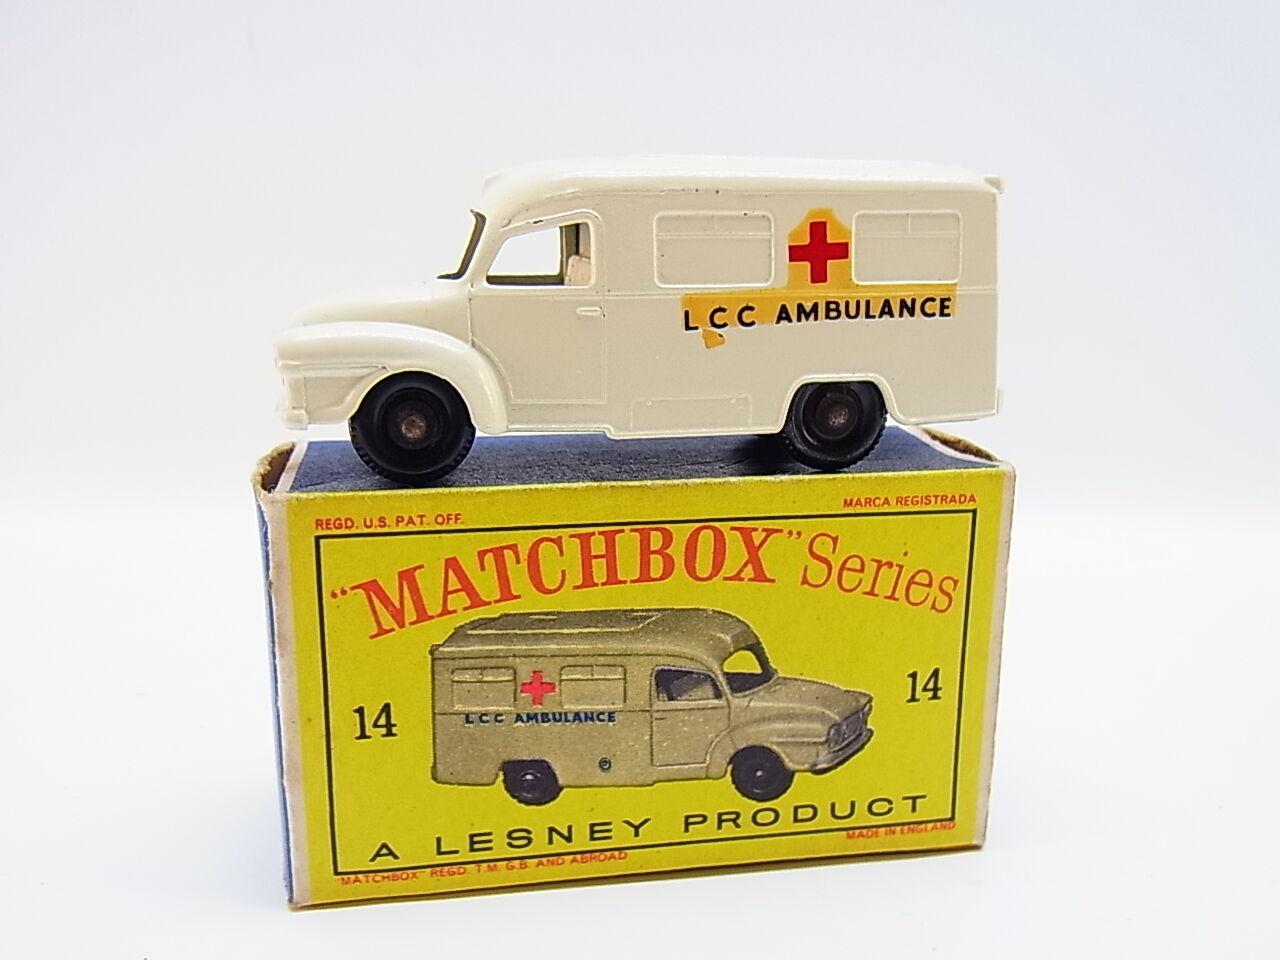 Lot 33333   MATCHBOX 14 C Lomas Ambulance LCC modèle comme neuf  D  - Box